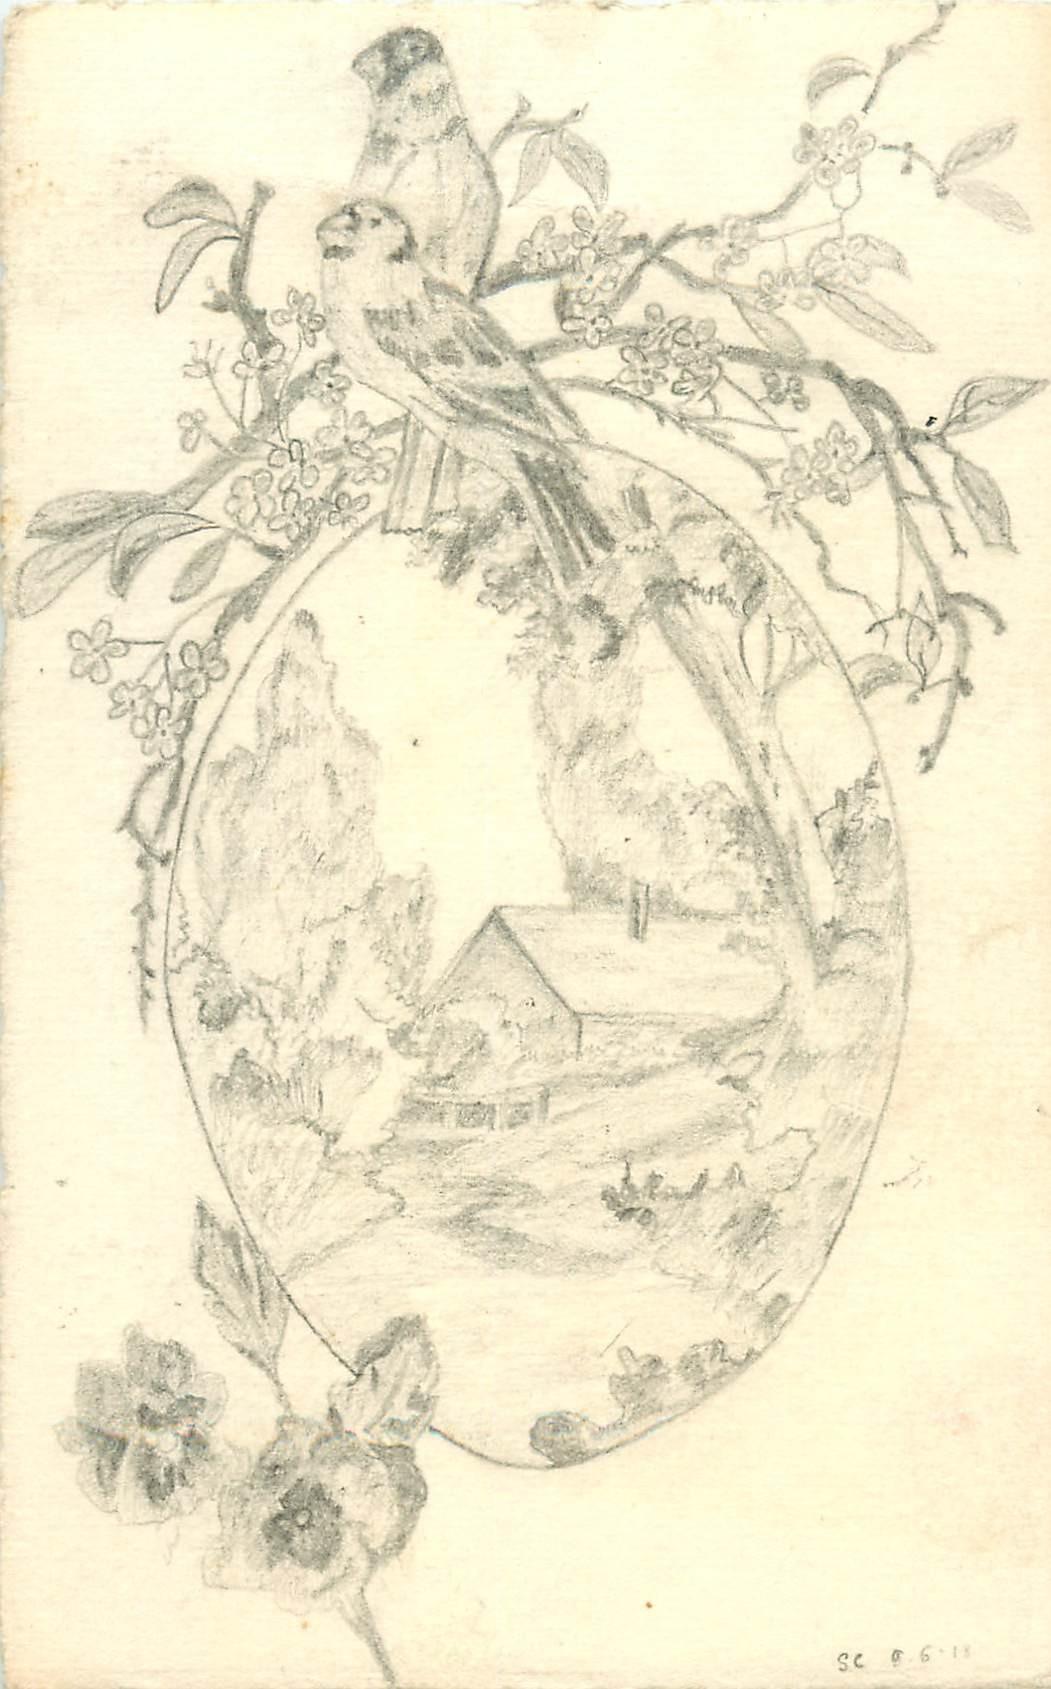 Carte postale dessinée à la main signée Suzanne C. 1919